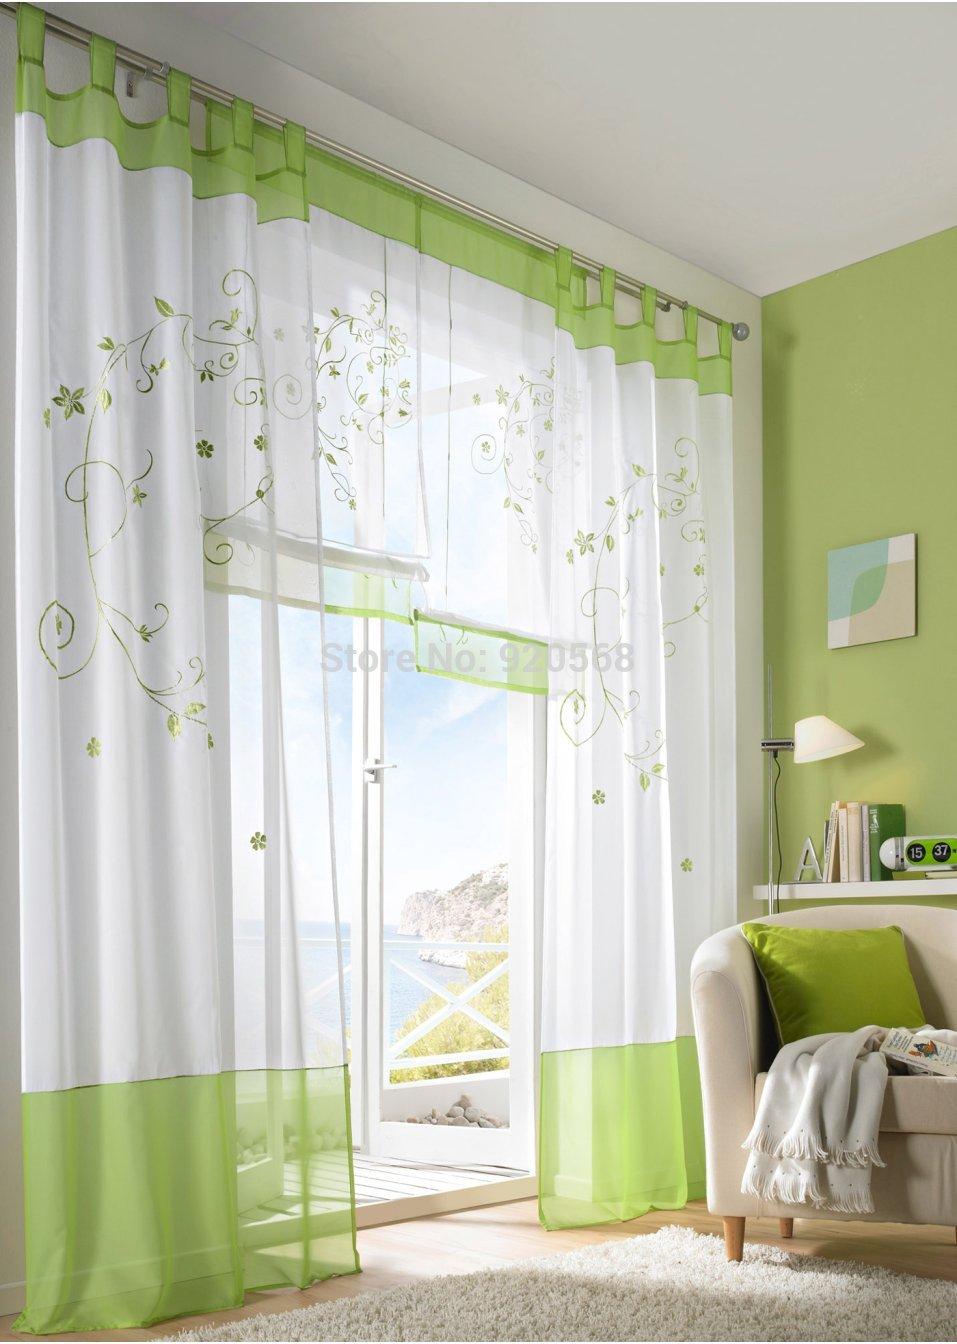 gardinen wohnzimmer grau – Dumss.com